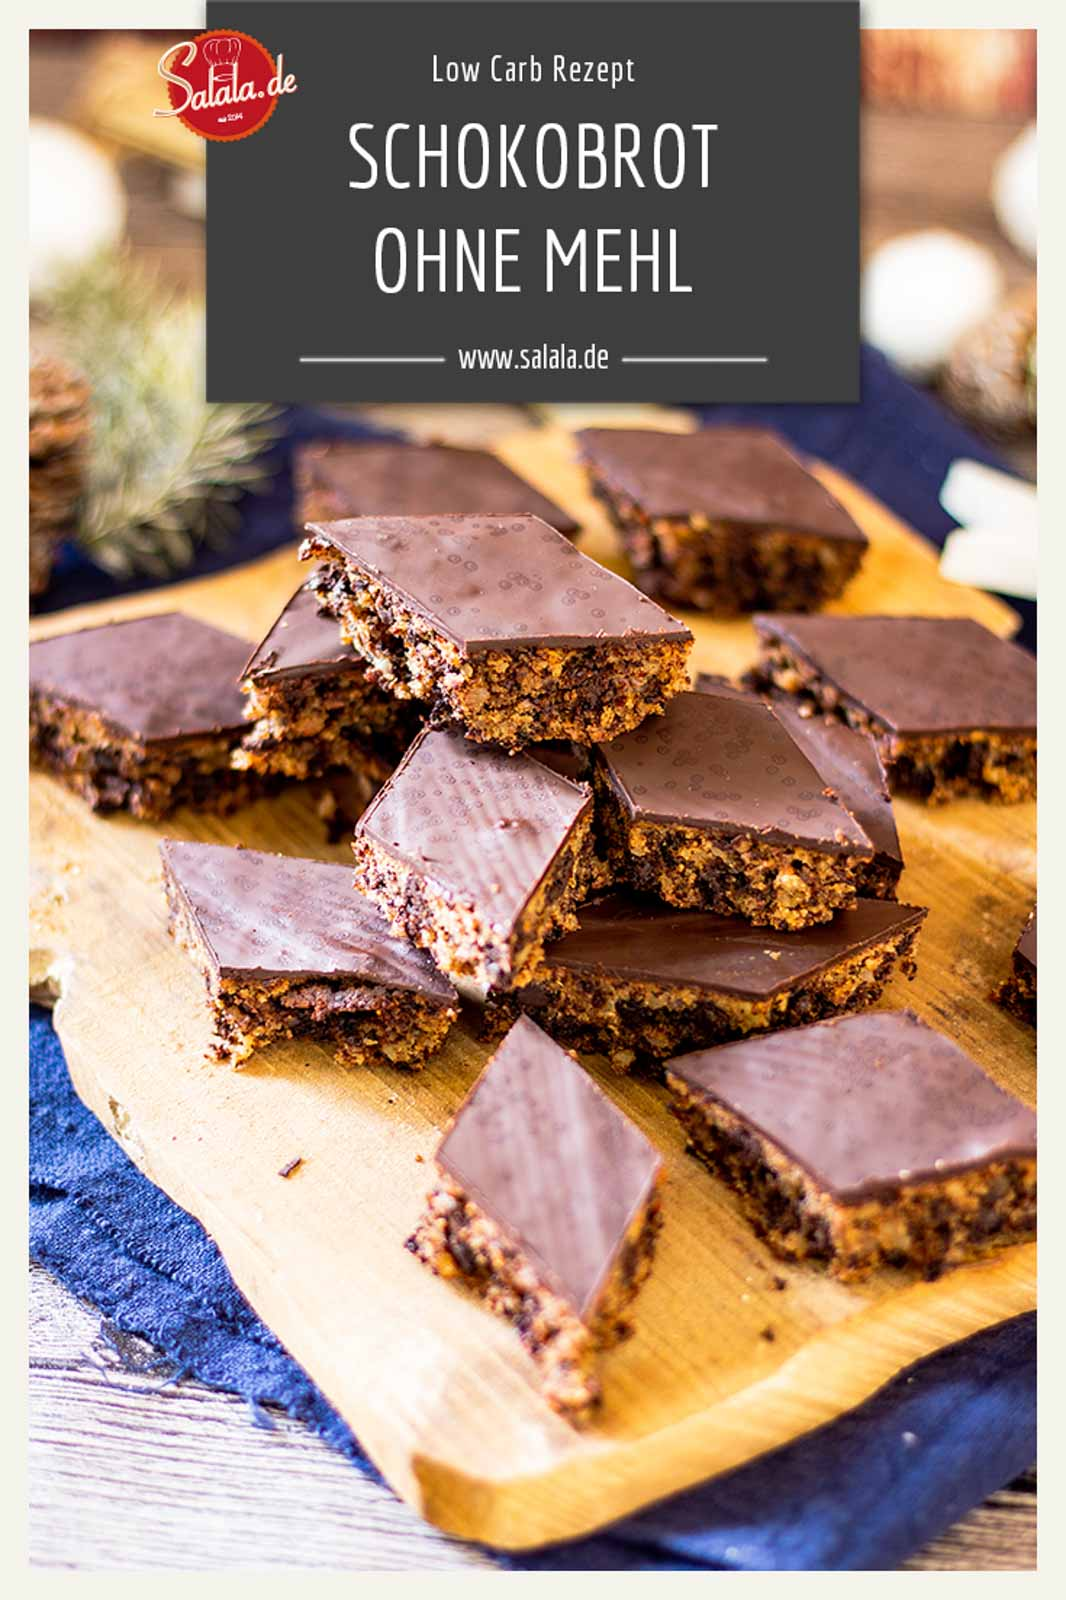 Schokoladenbrot Weihnachten.Schokoladenbrot Ohne Mehl By Happy Girl Salala De Low